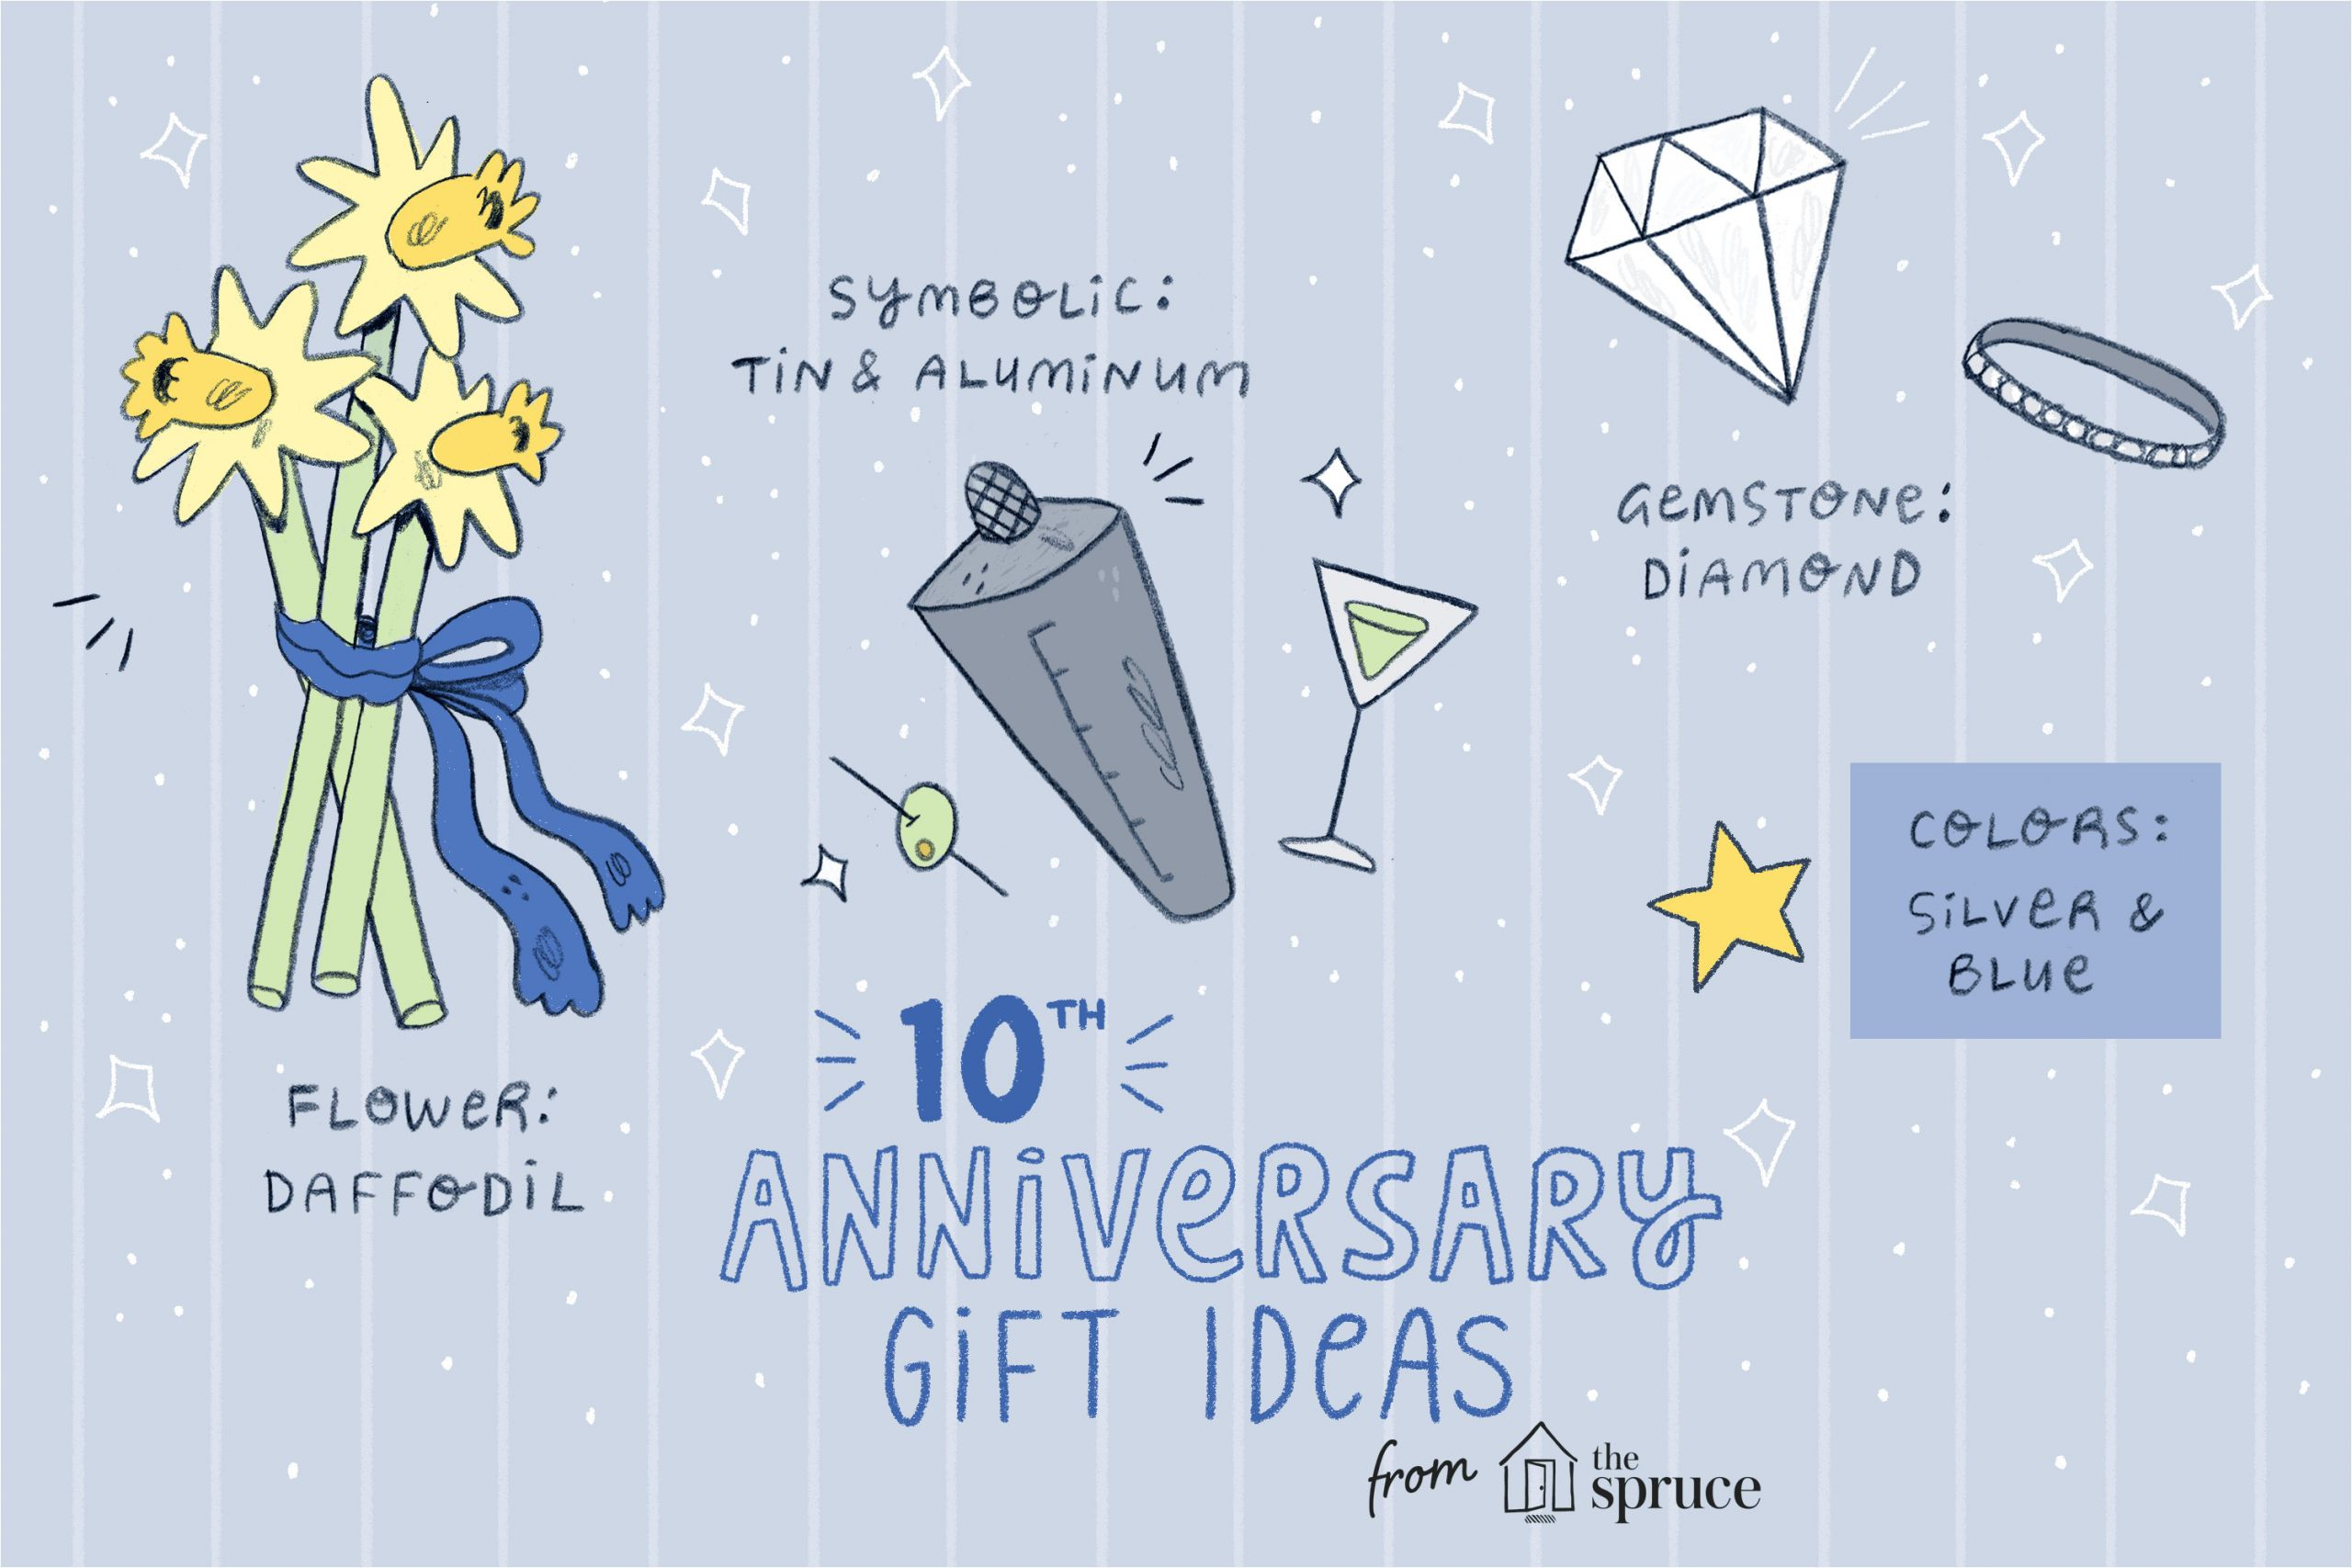 traditional 10th year anniversary gifts 2301820 v2 5b56397d46e0fb003720980b png